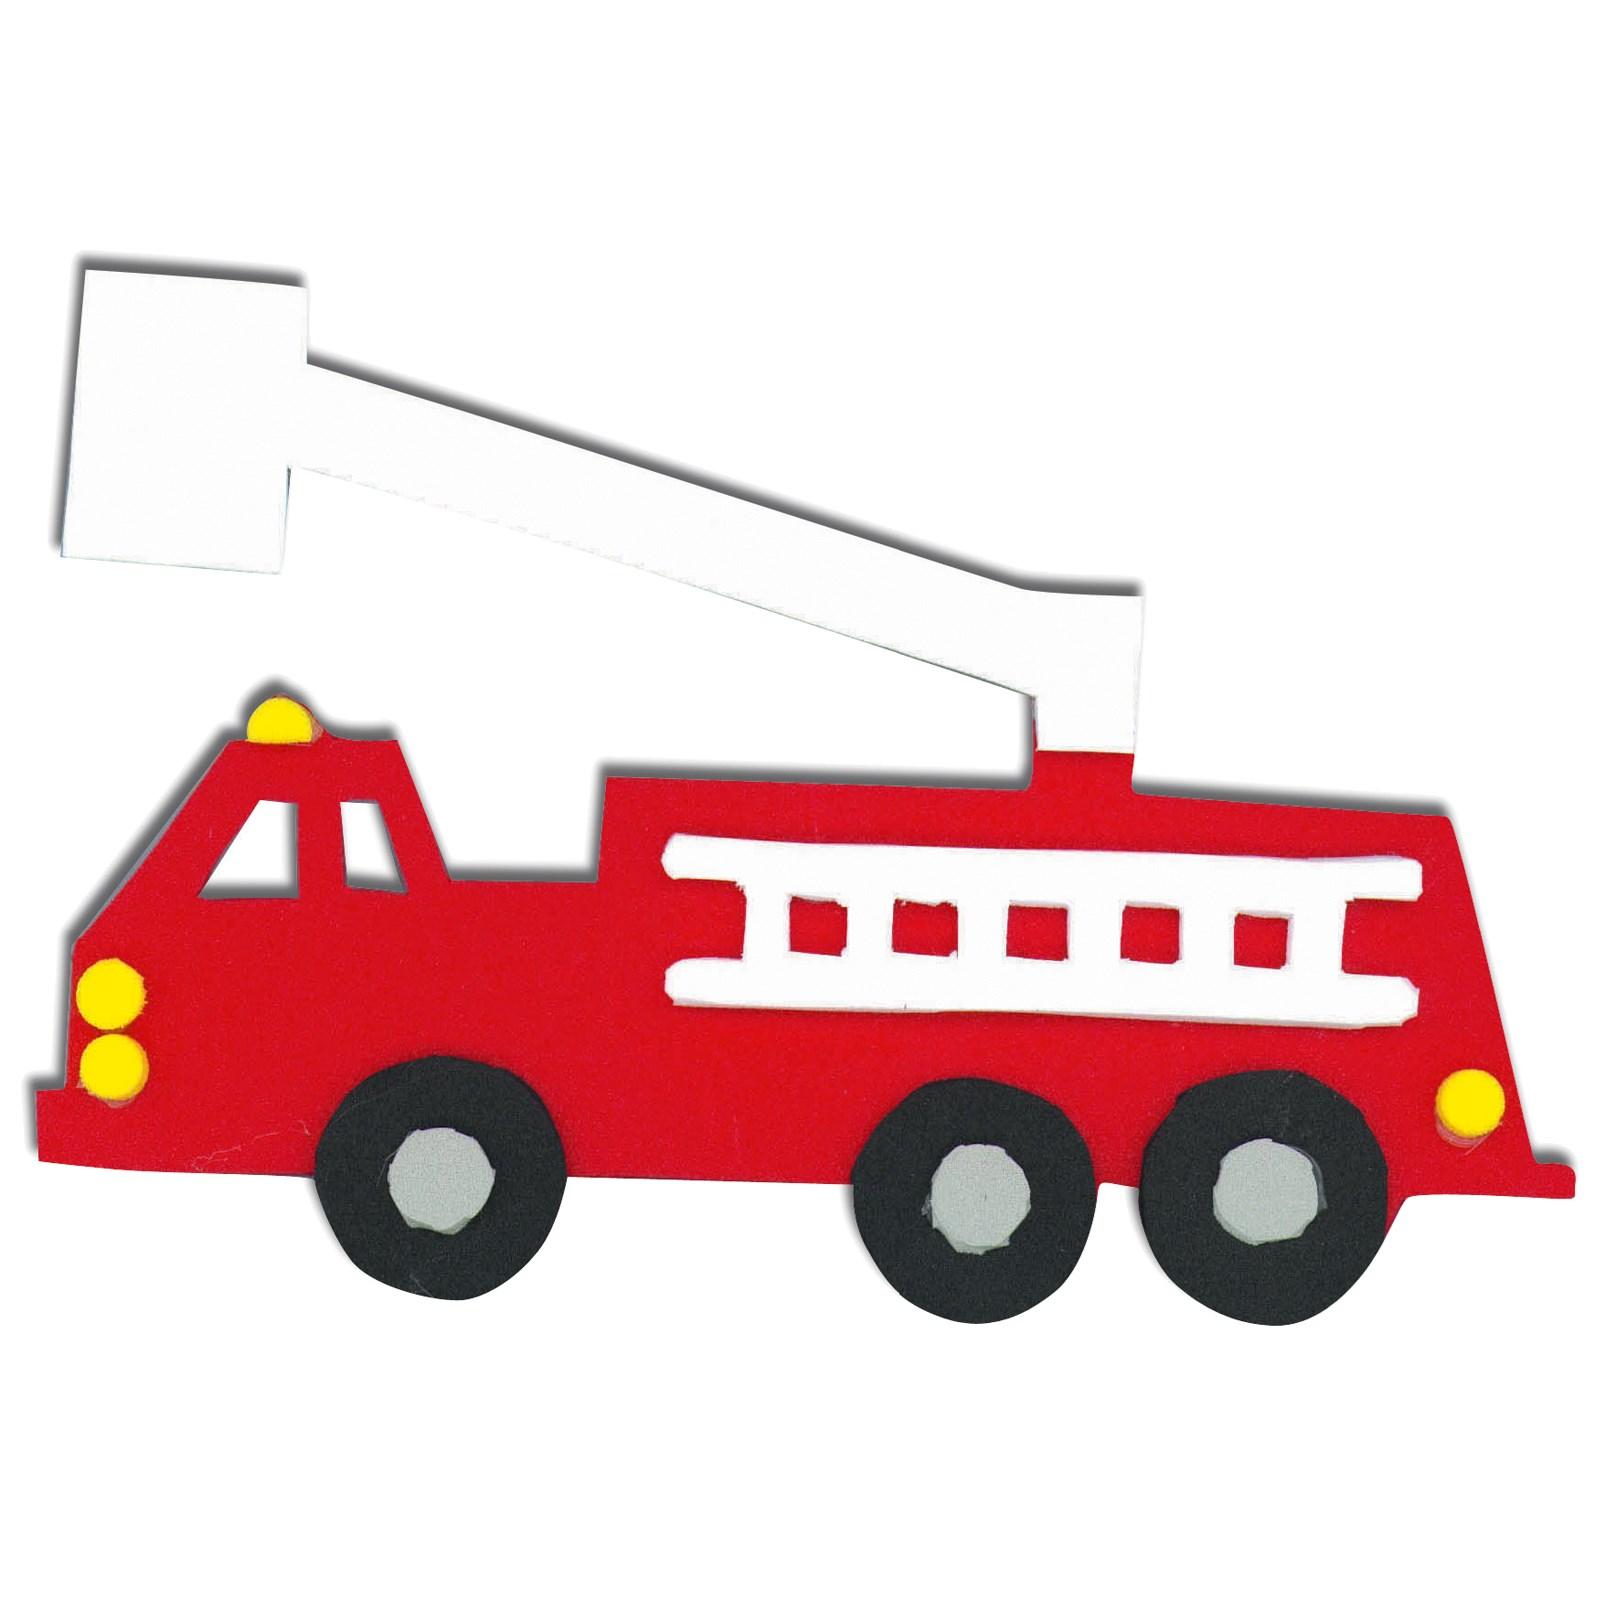 Image of Fire Trucks Foam Activity Kit